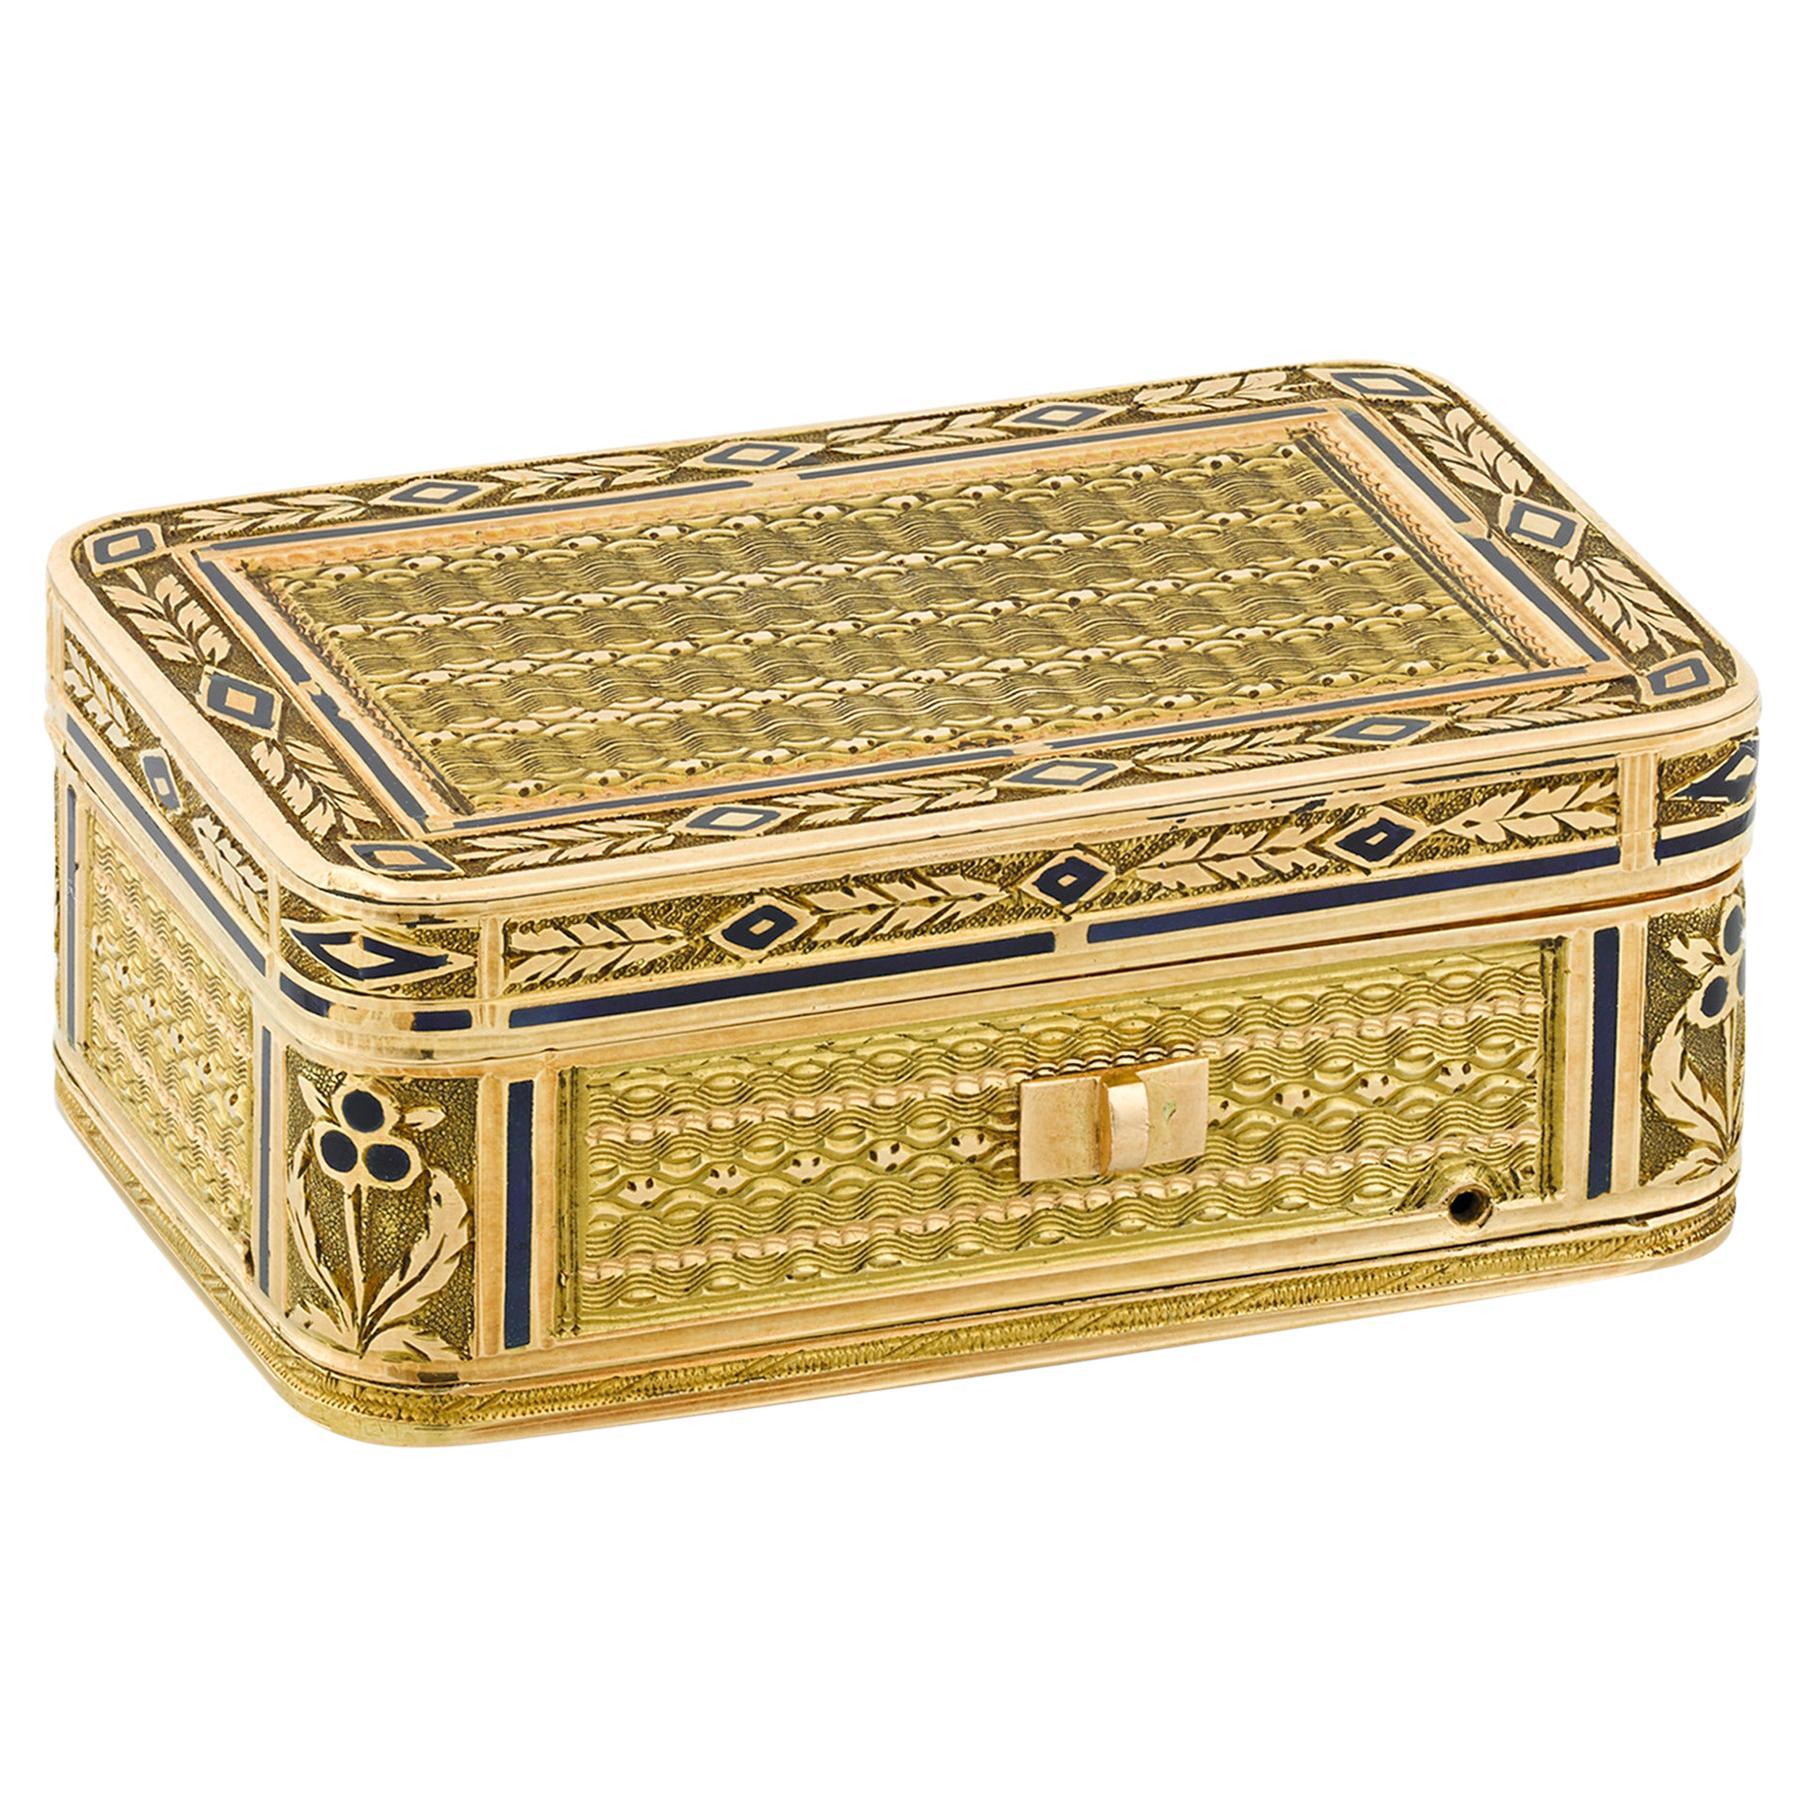 19th Century Swiss Gold Musical Vinaigrette